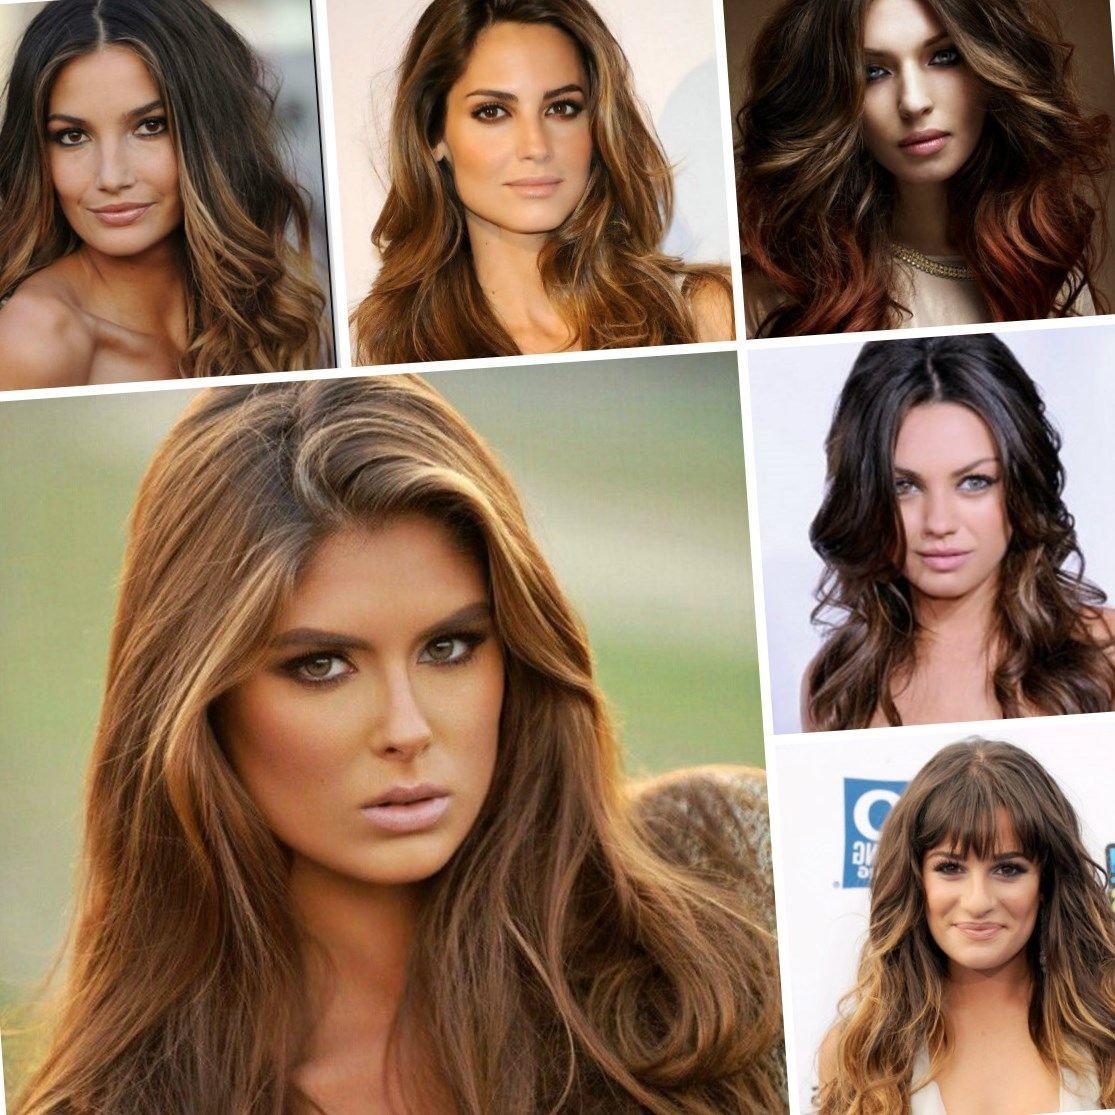 Gallery of Highlights For Dark Brown Hair 2017 Minimalist Design ...